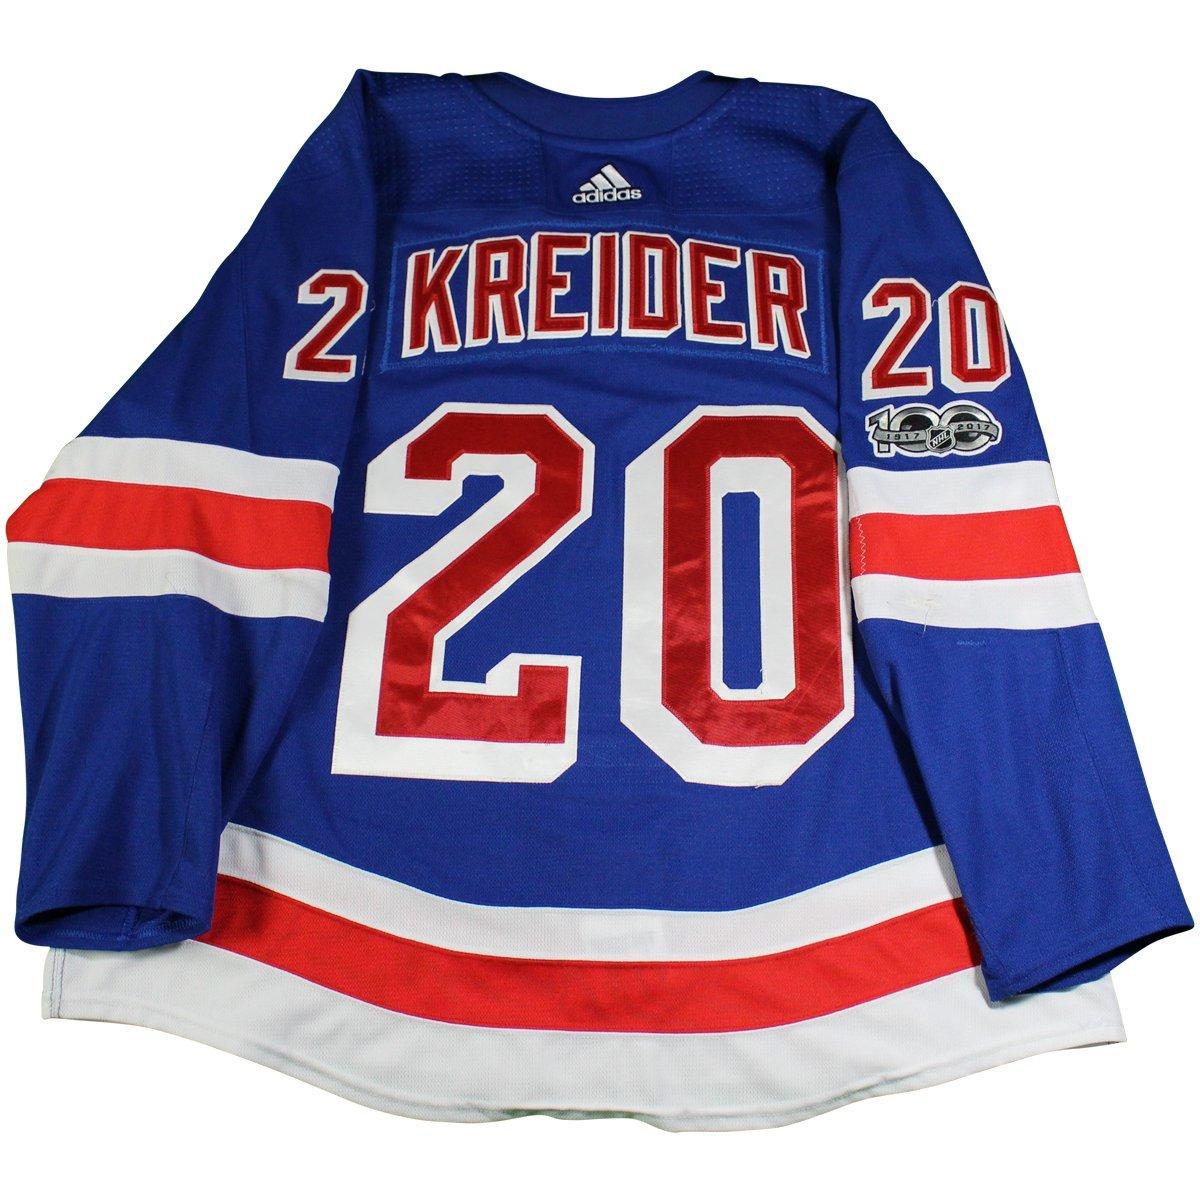 best service 903f1 6435e Chris Kreider New York Rangers 2017-2018 Game Used #20 Set 1 Blue Jersey w/  100th Anniversary Patch (10/8/2017 - 11/22/2017)